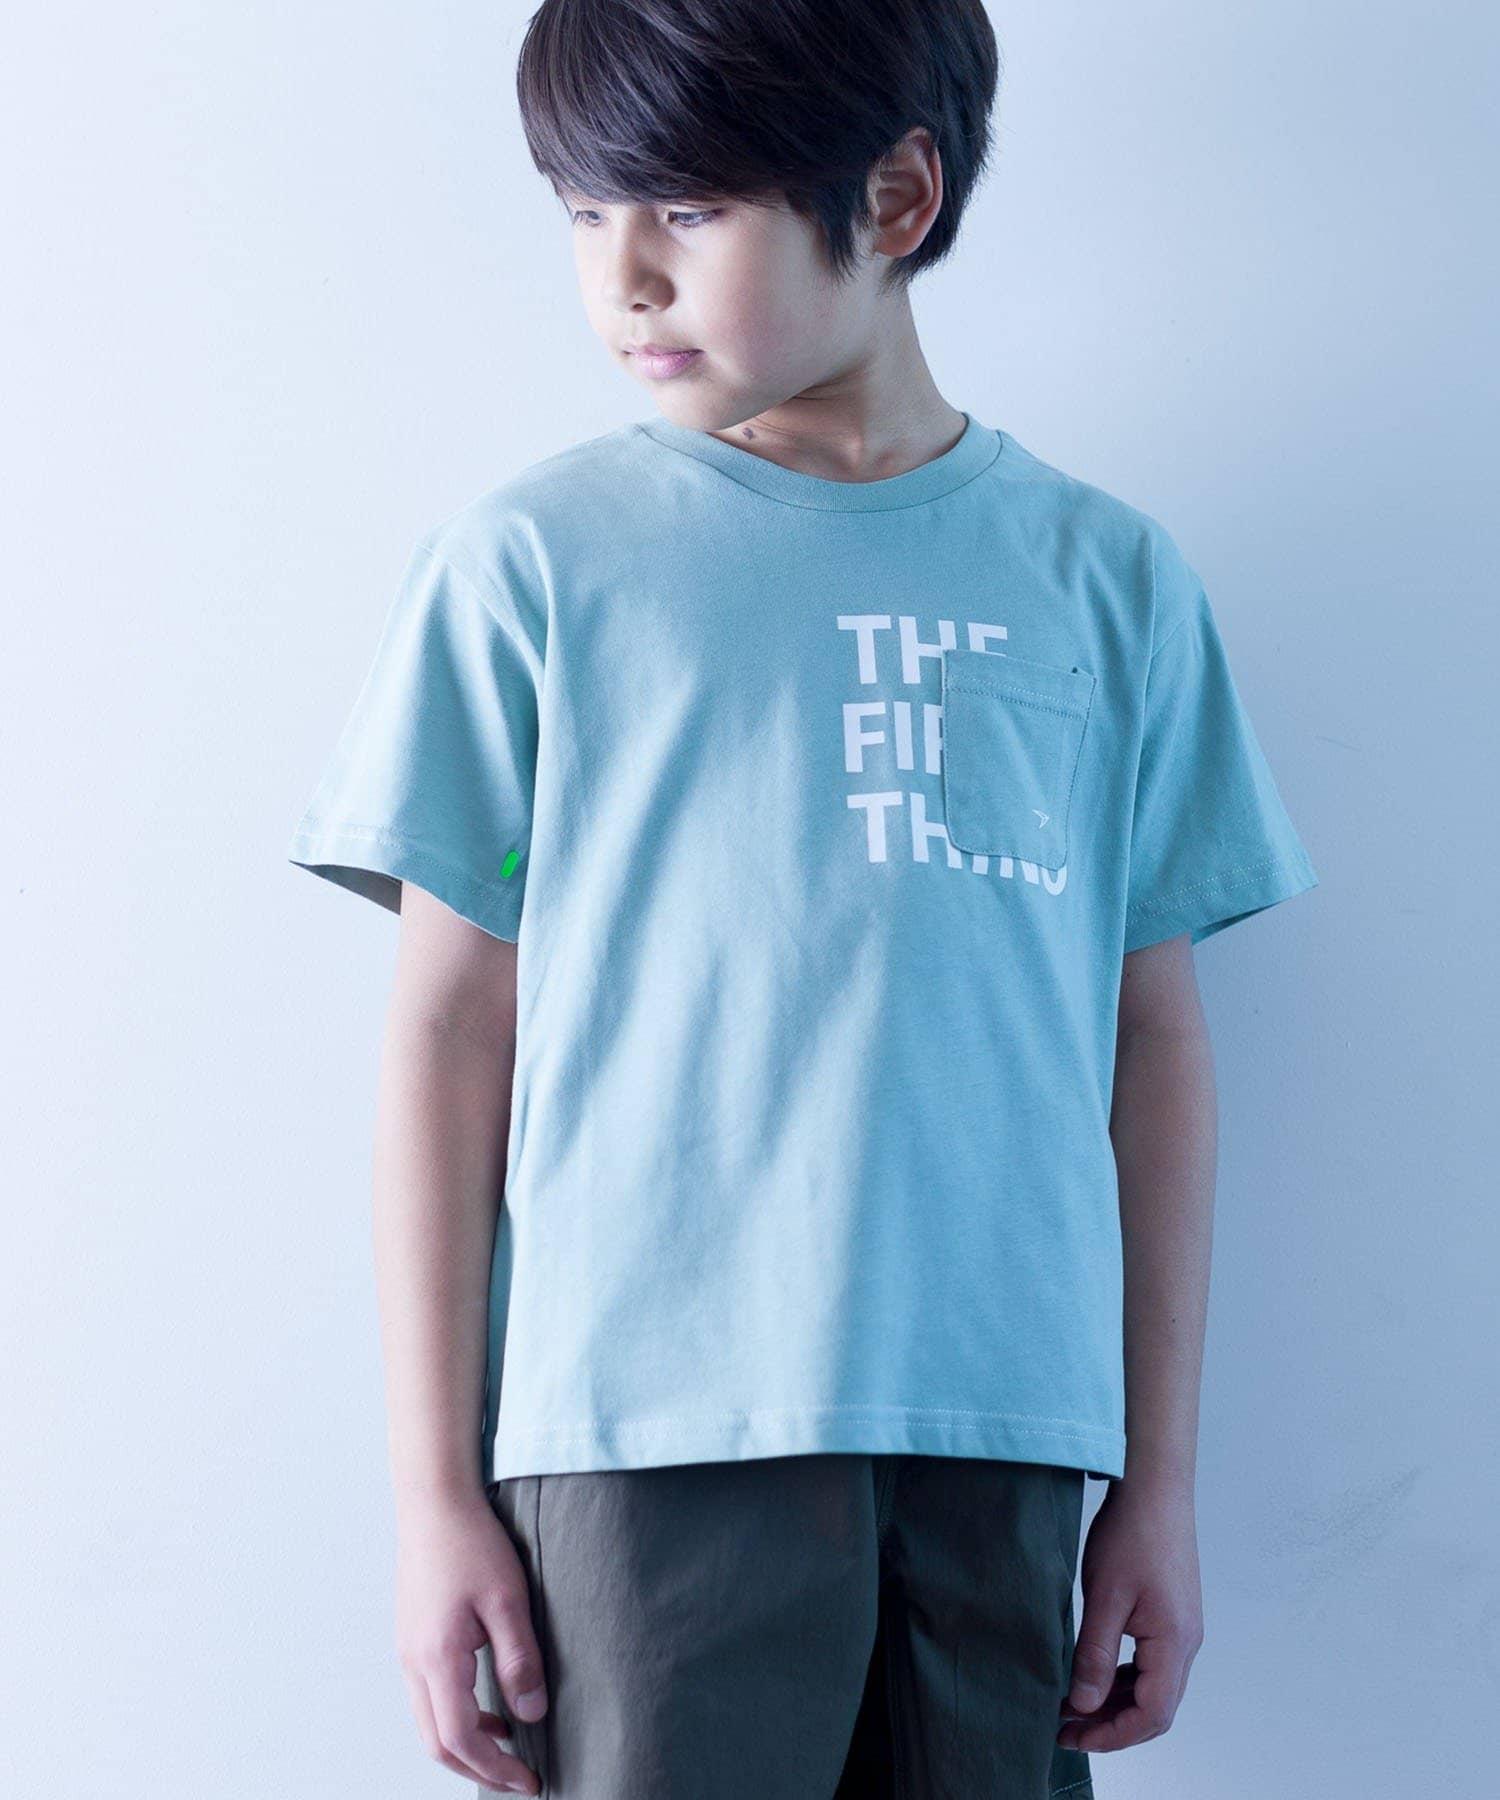 CIAOPANIC TYPY(チャオパニックティピー) キッズ 【KIDS】【瞬足】シルケット天竺ポケットTee ミント